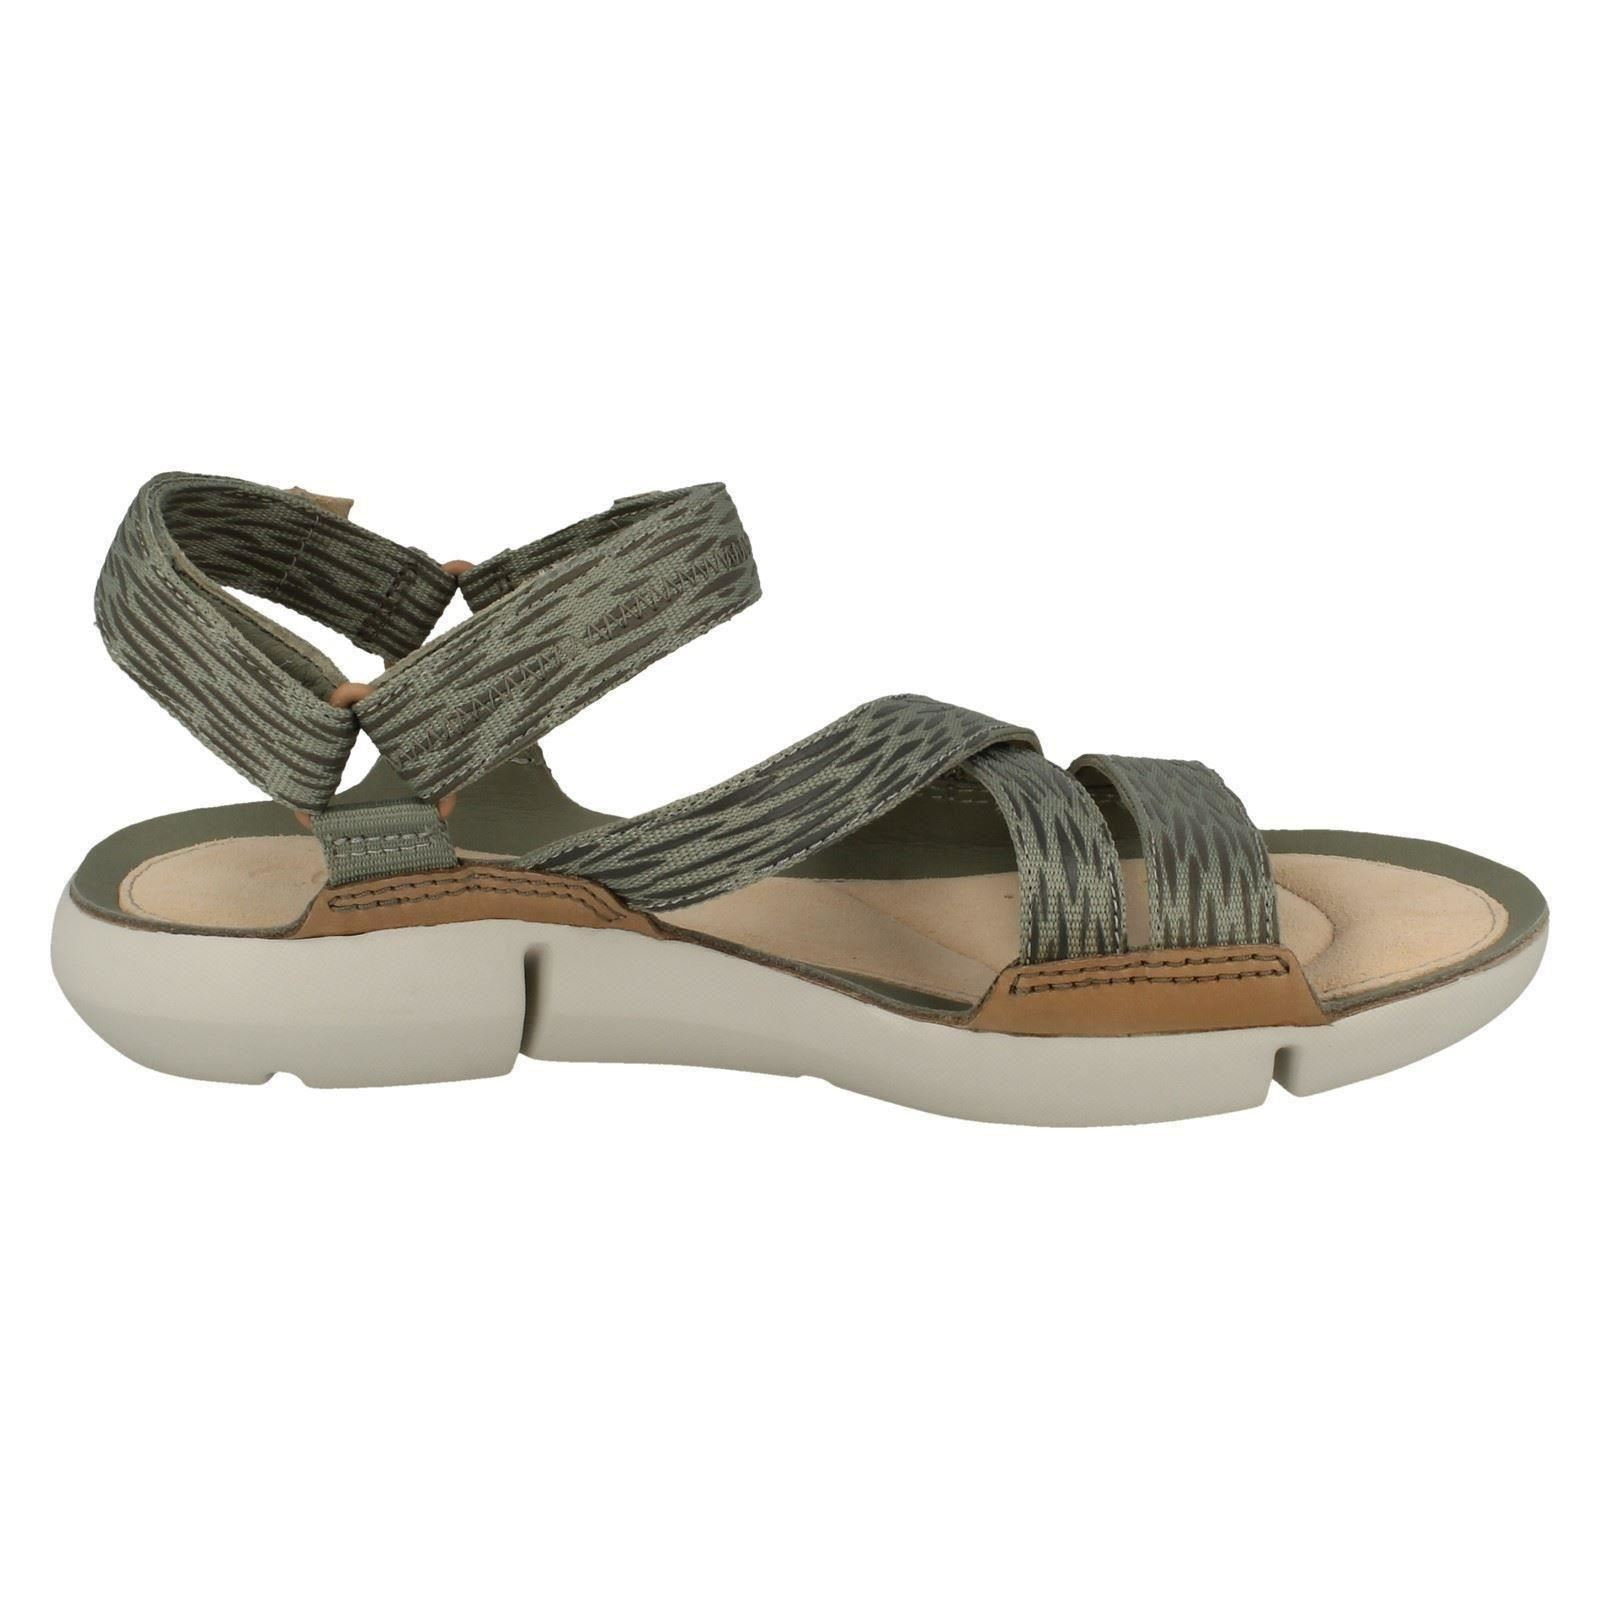 Ladies Clarks Riptape Fastening Open Toe Strappy Sandals /'Tri Sienna/'